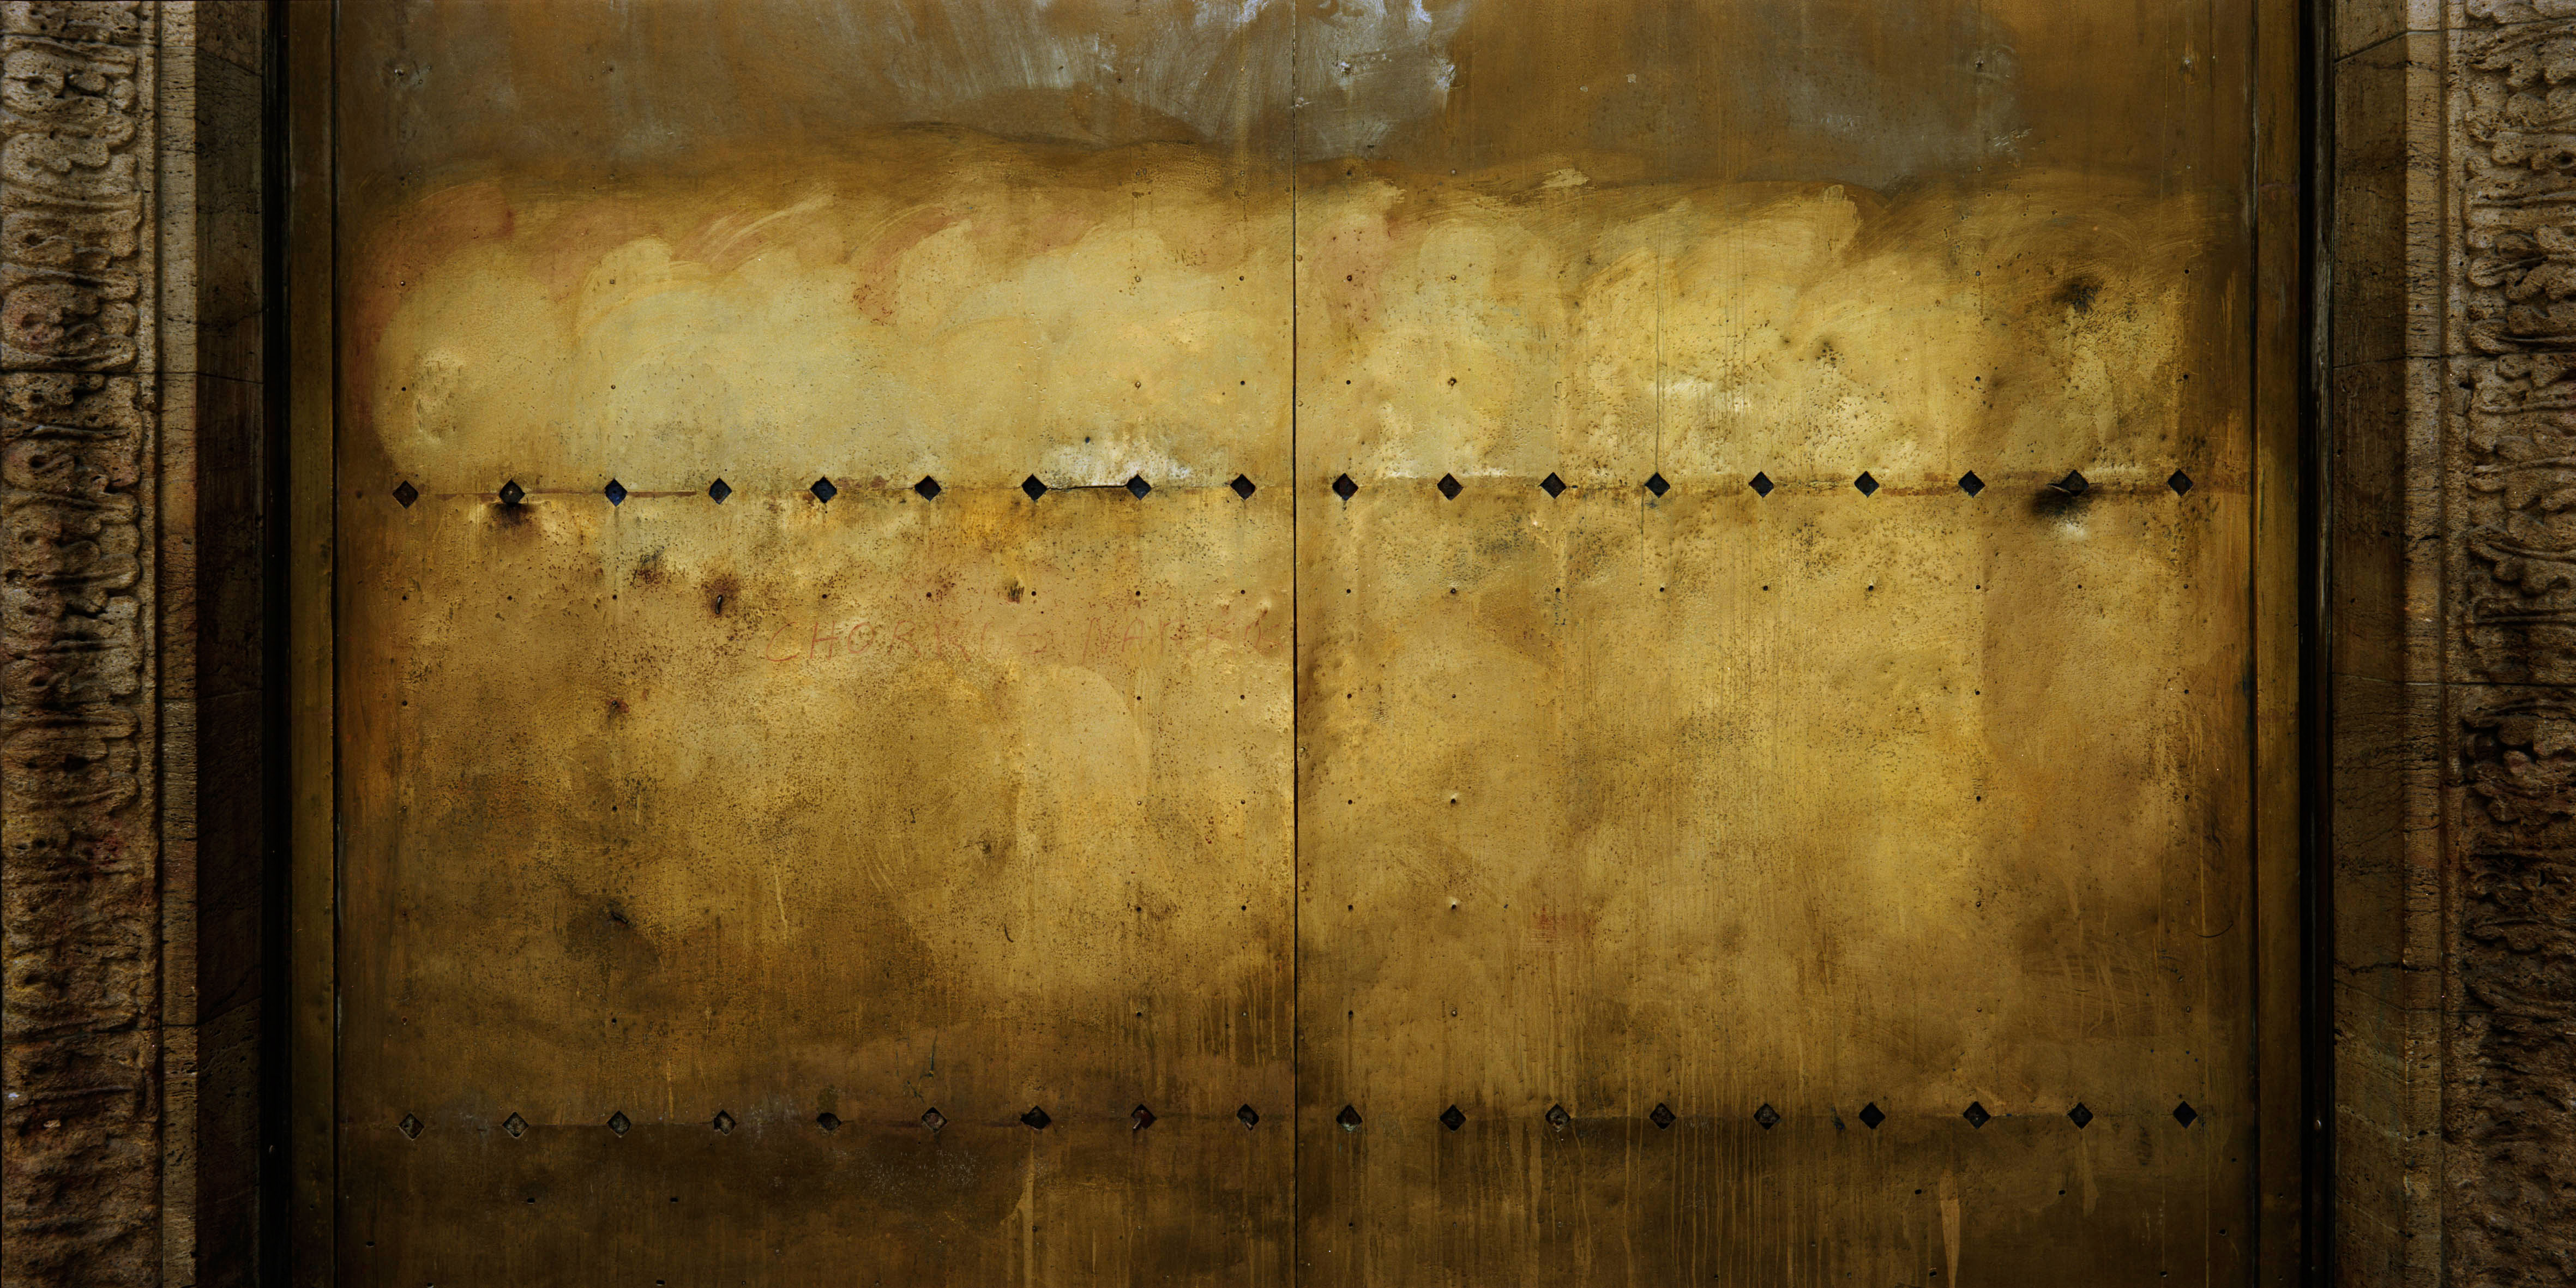 Juan Travnik HSBC, 2005 Copia C, 60 x 120 cm Col. del artista